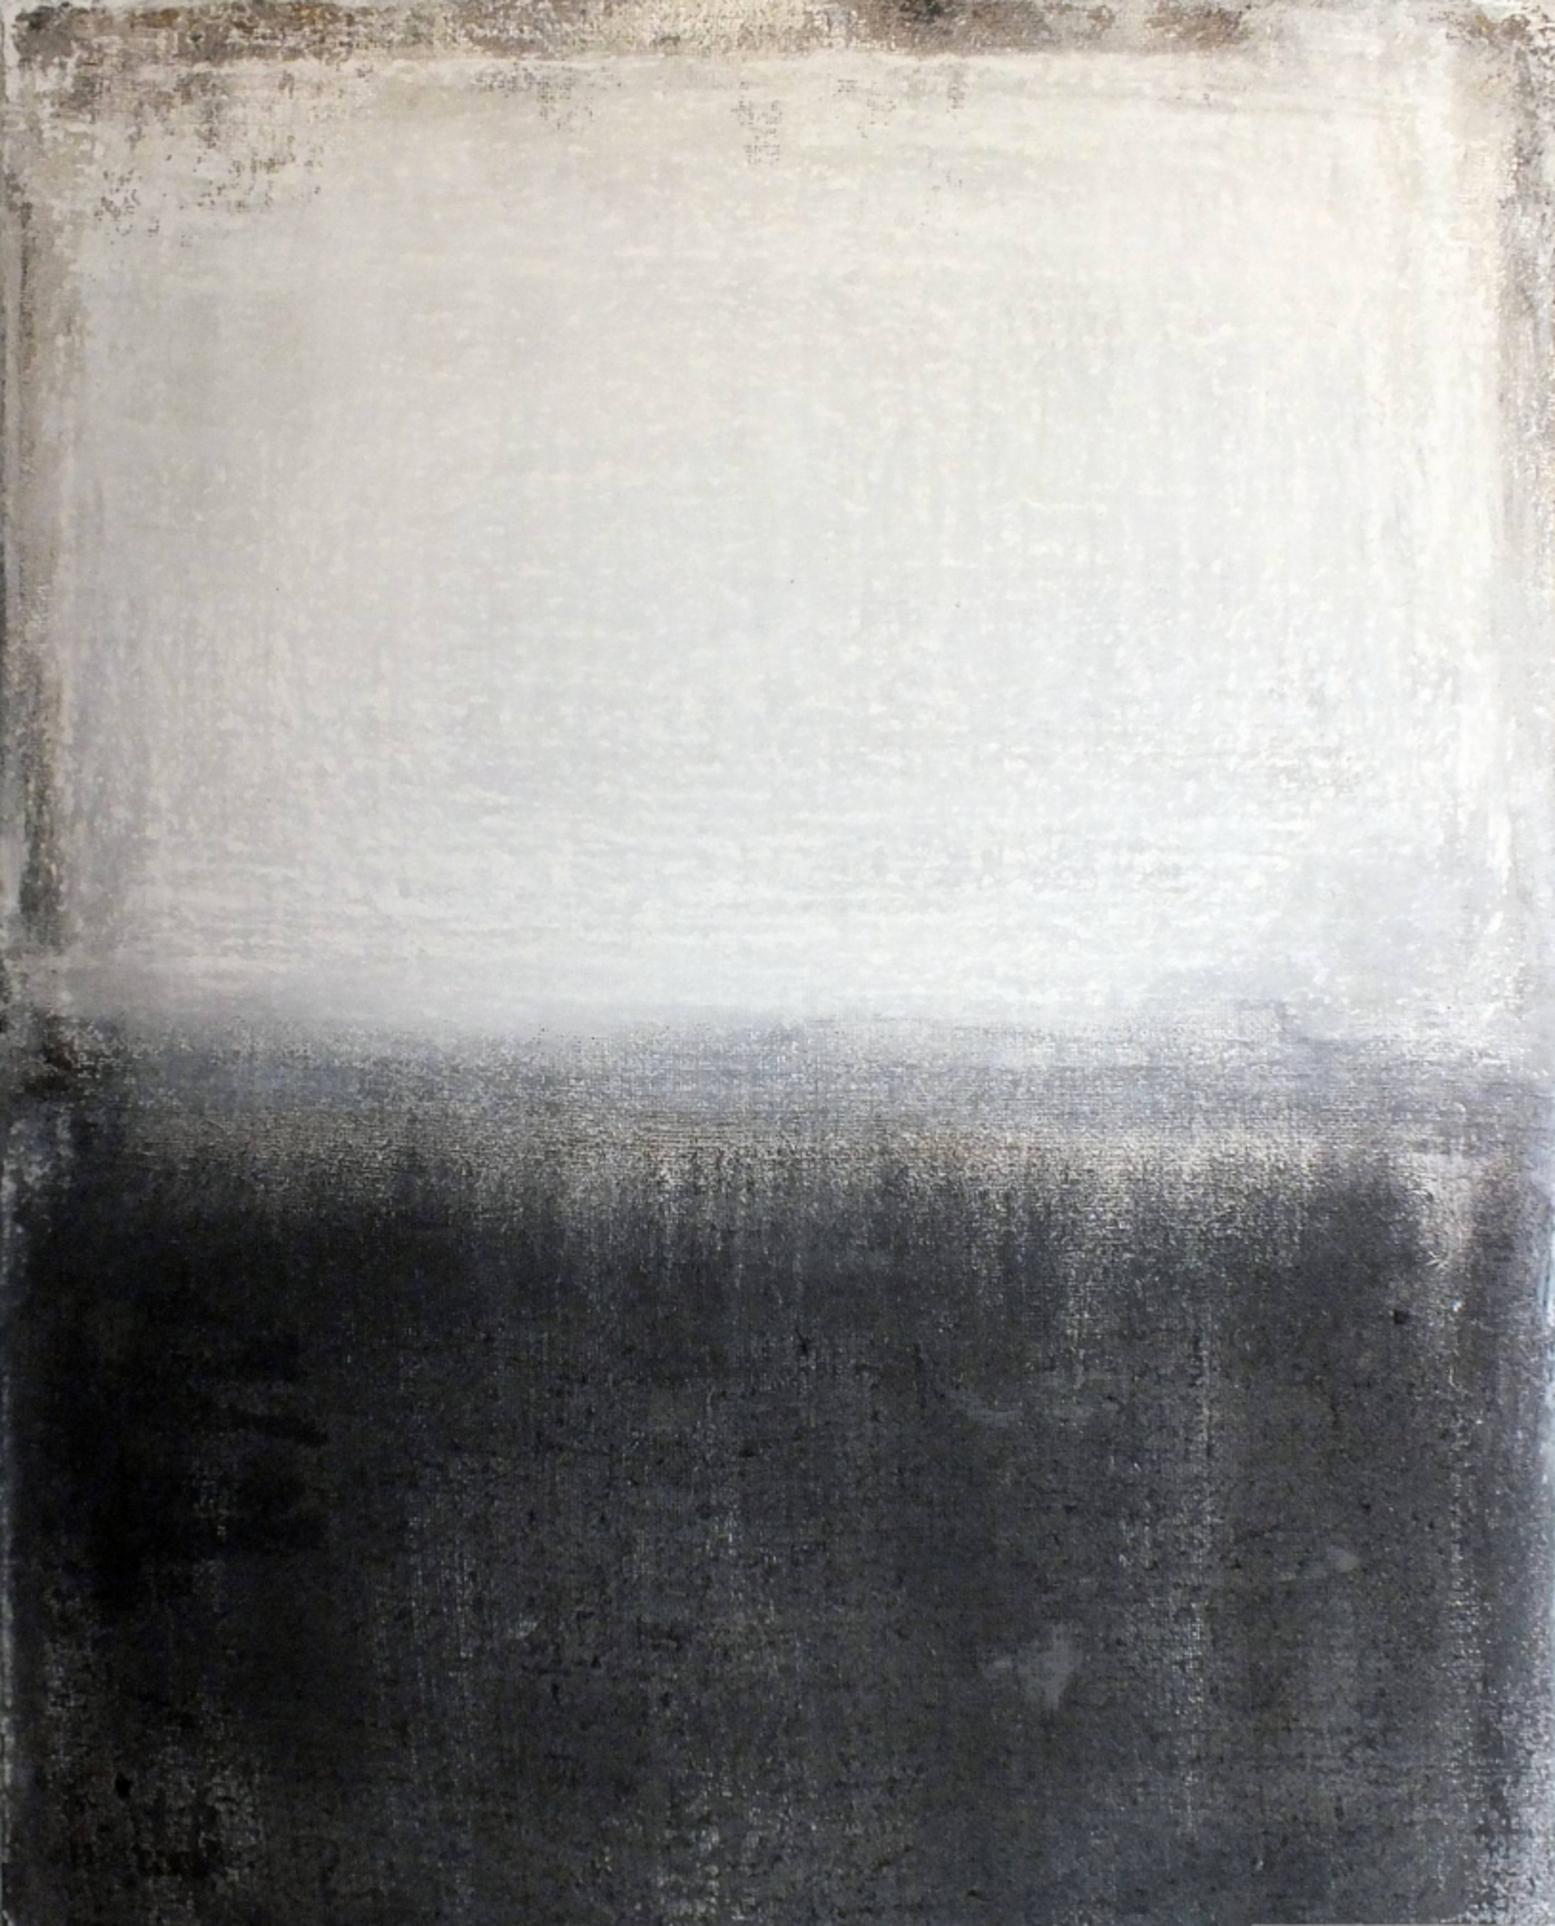 Landscape 21, Minimalist Mixed media Art Contemporary Abstract Black White